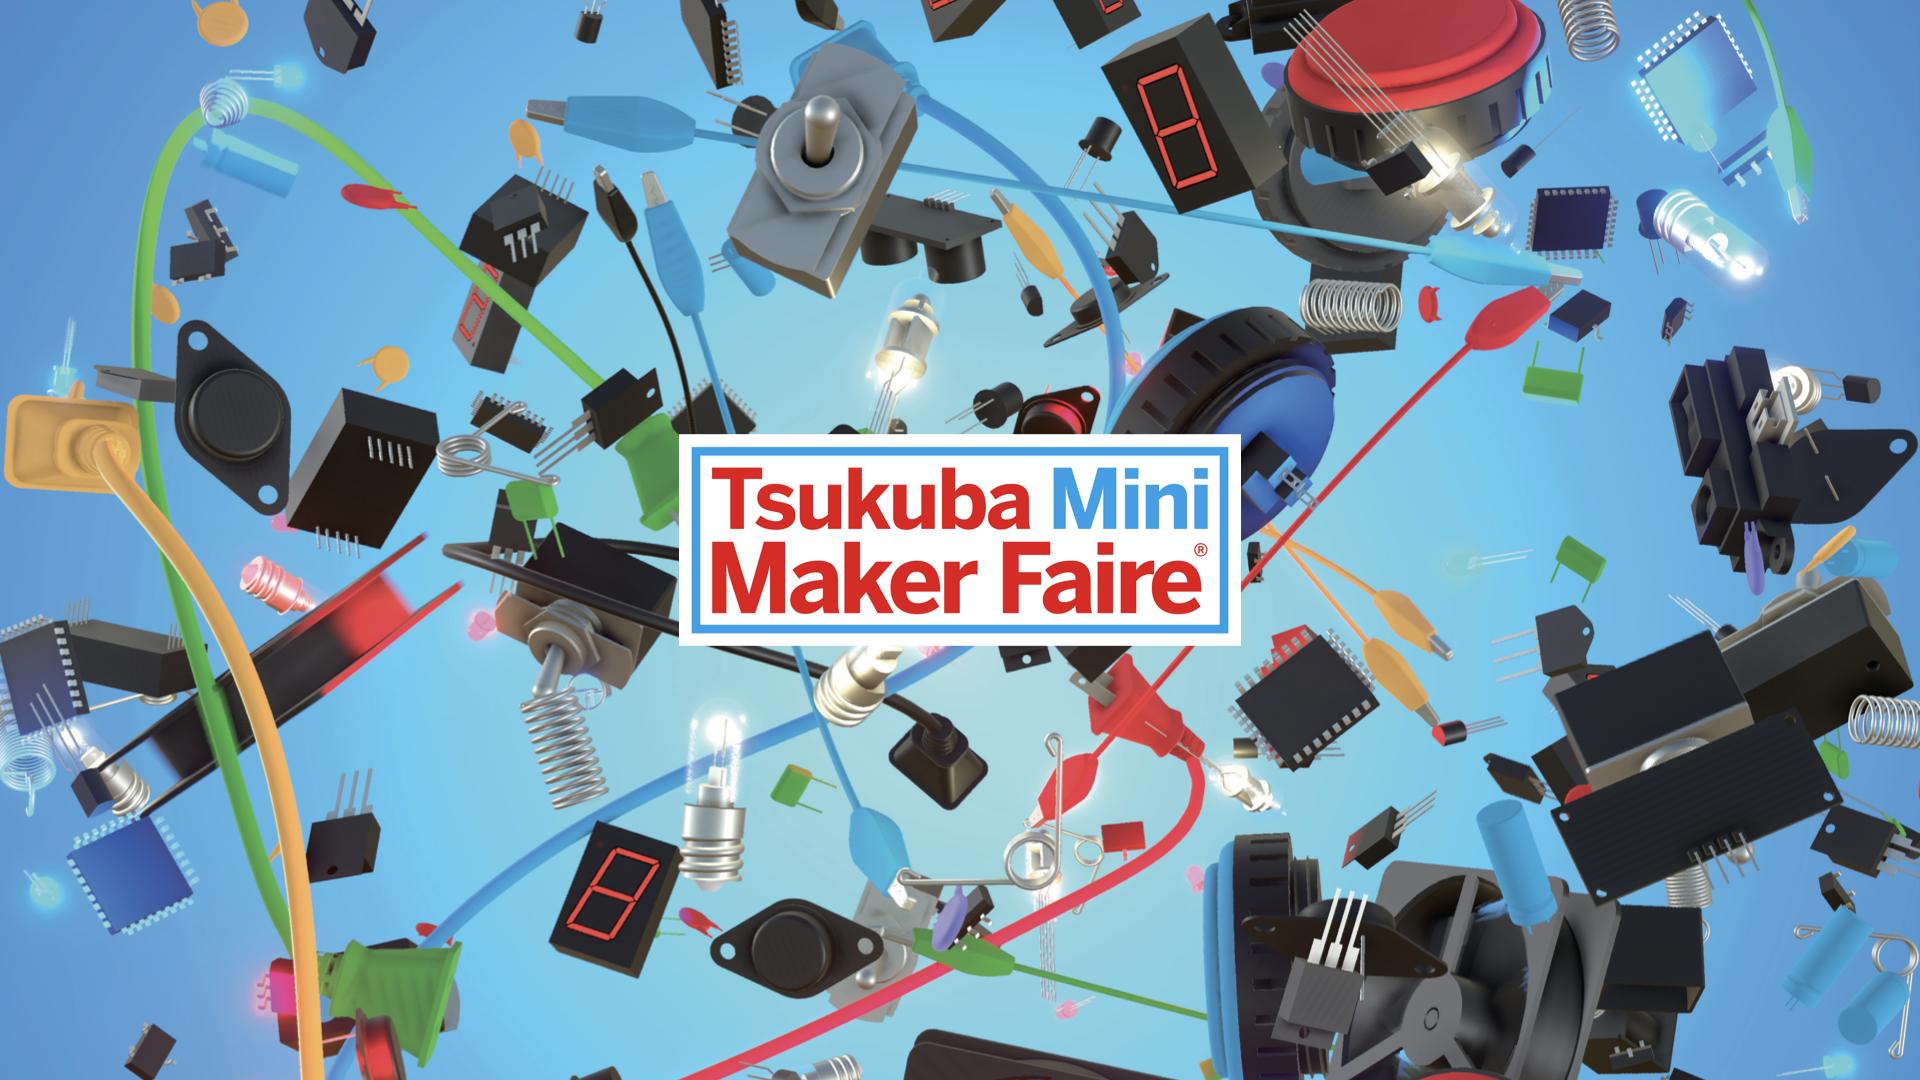 Tsukuba mini maker faire